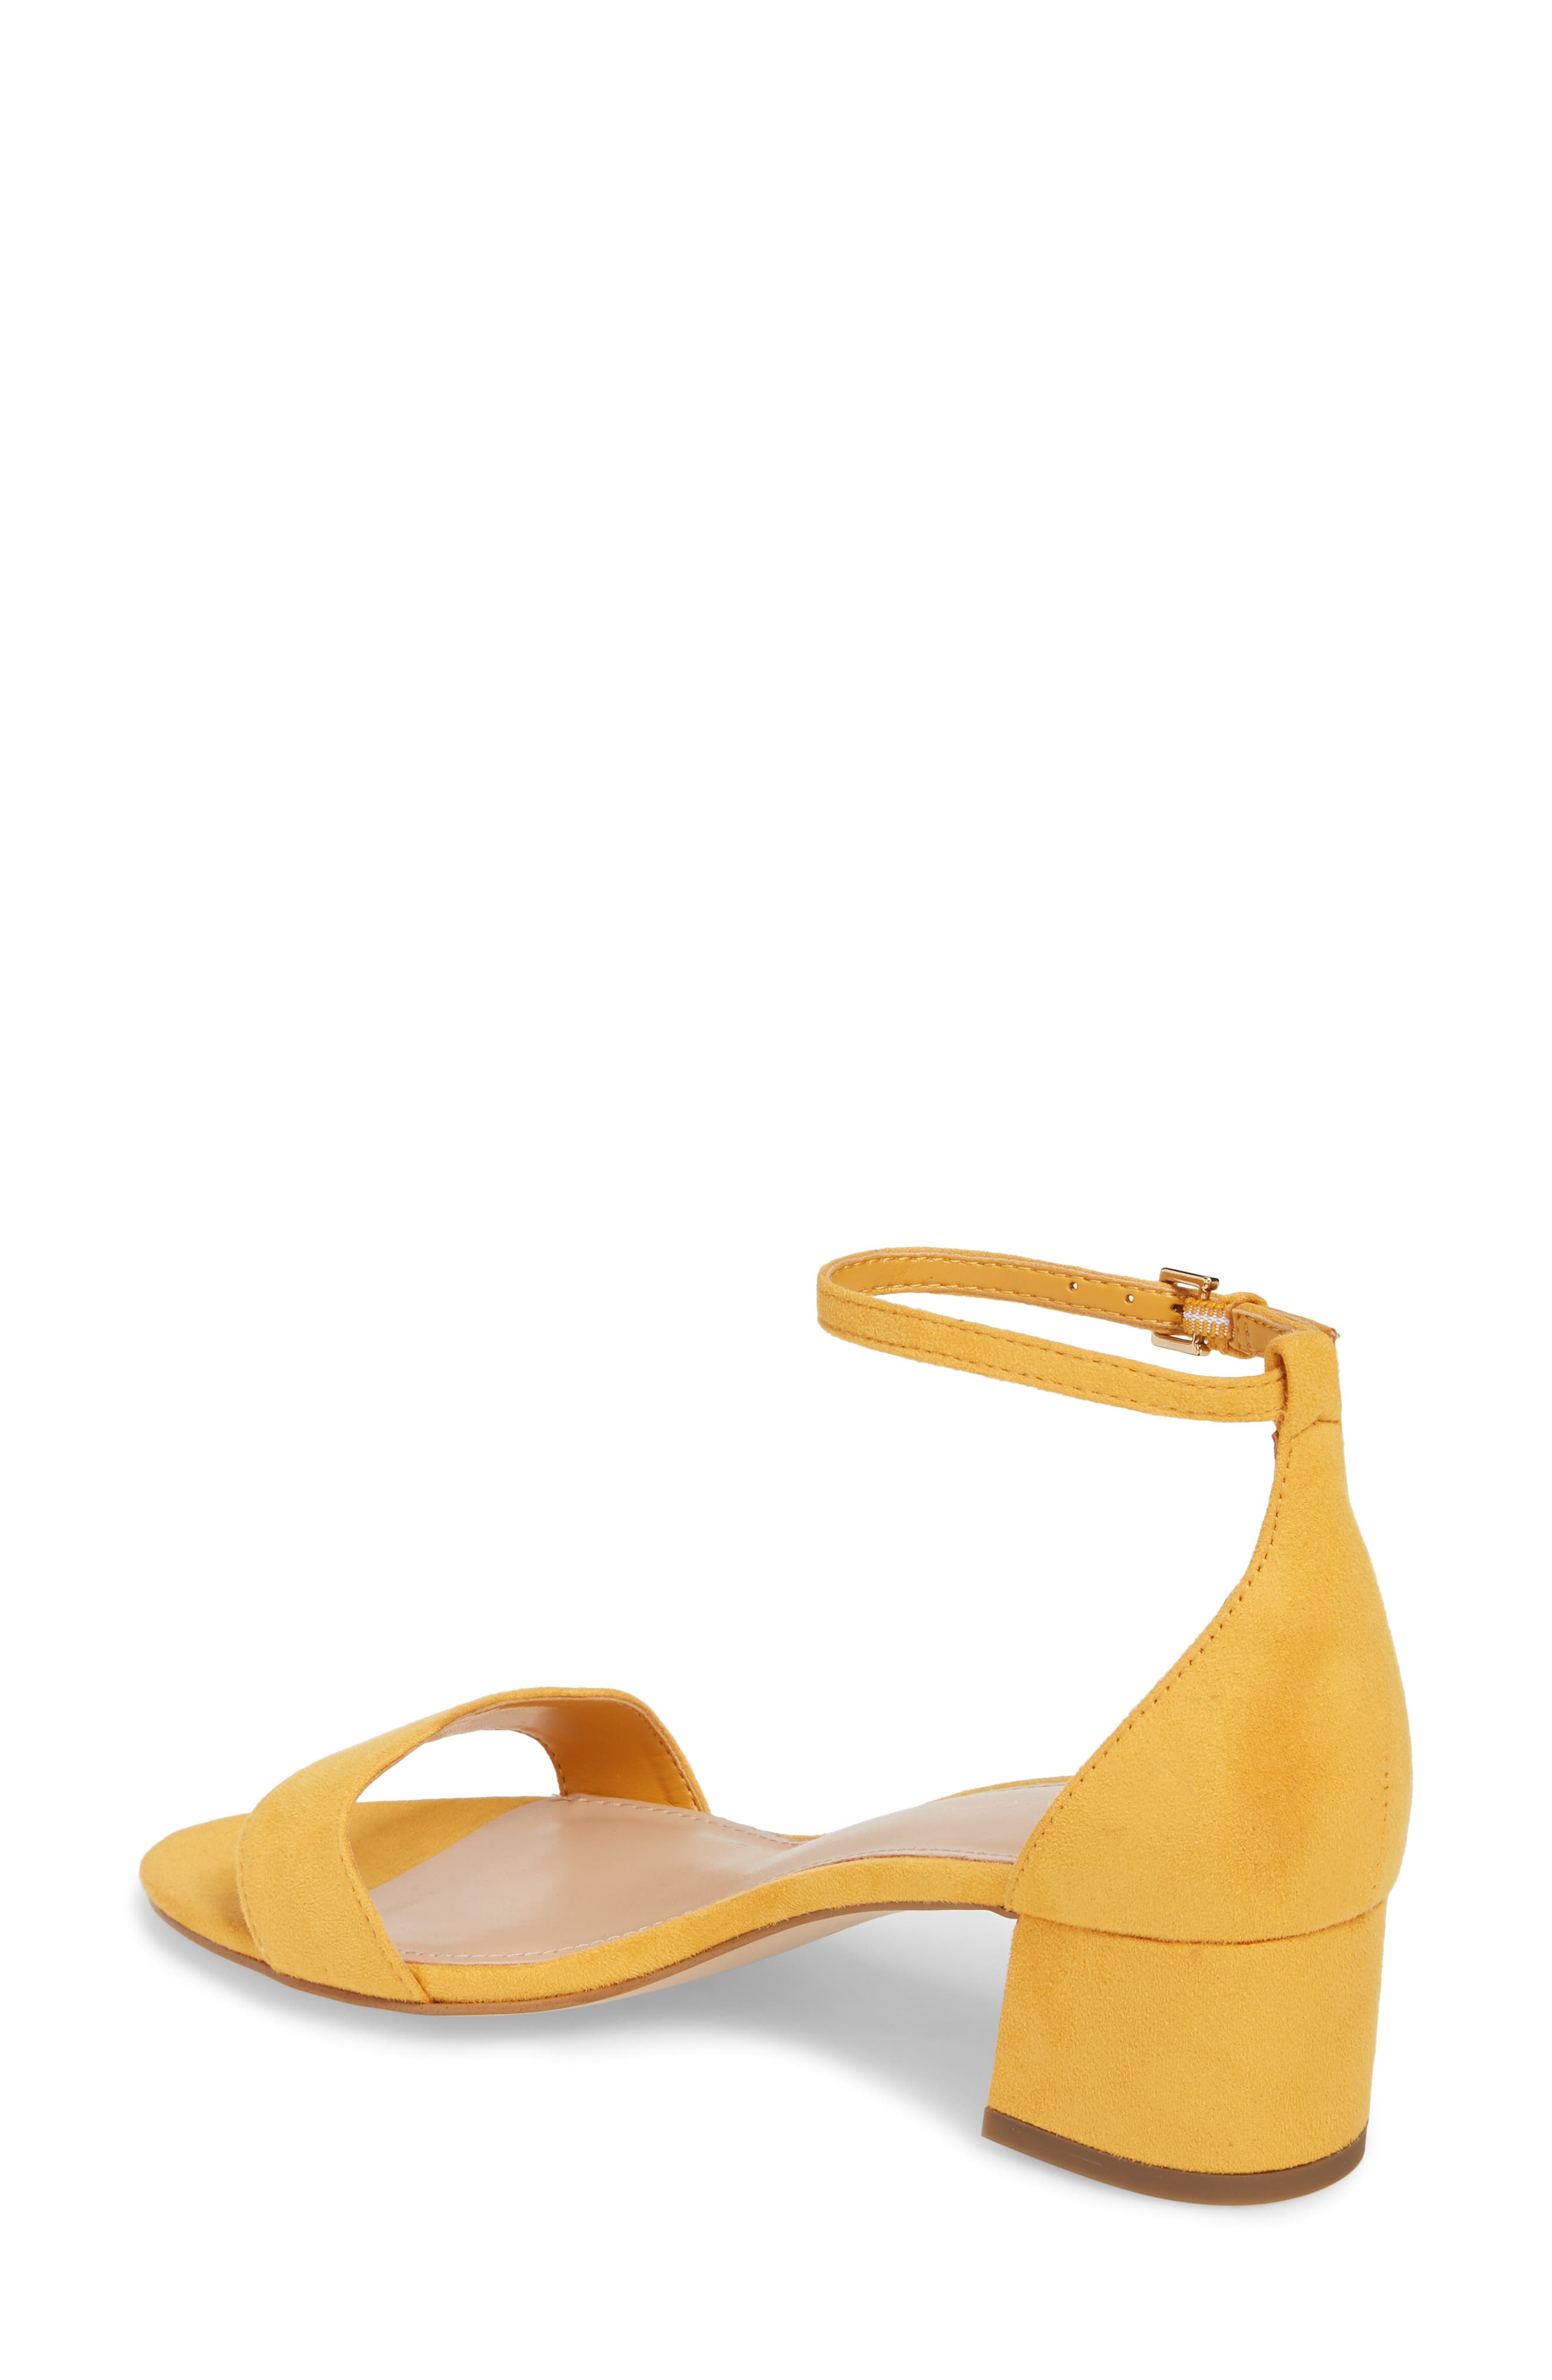 Farlyn Ankle Strap Sandal,                             Alternate thumbnail 2, color,